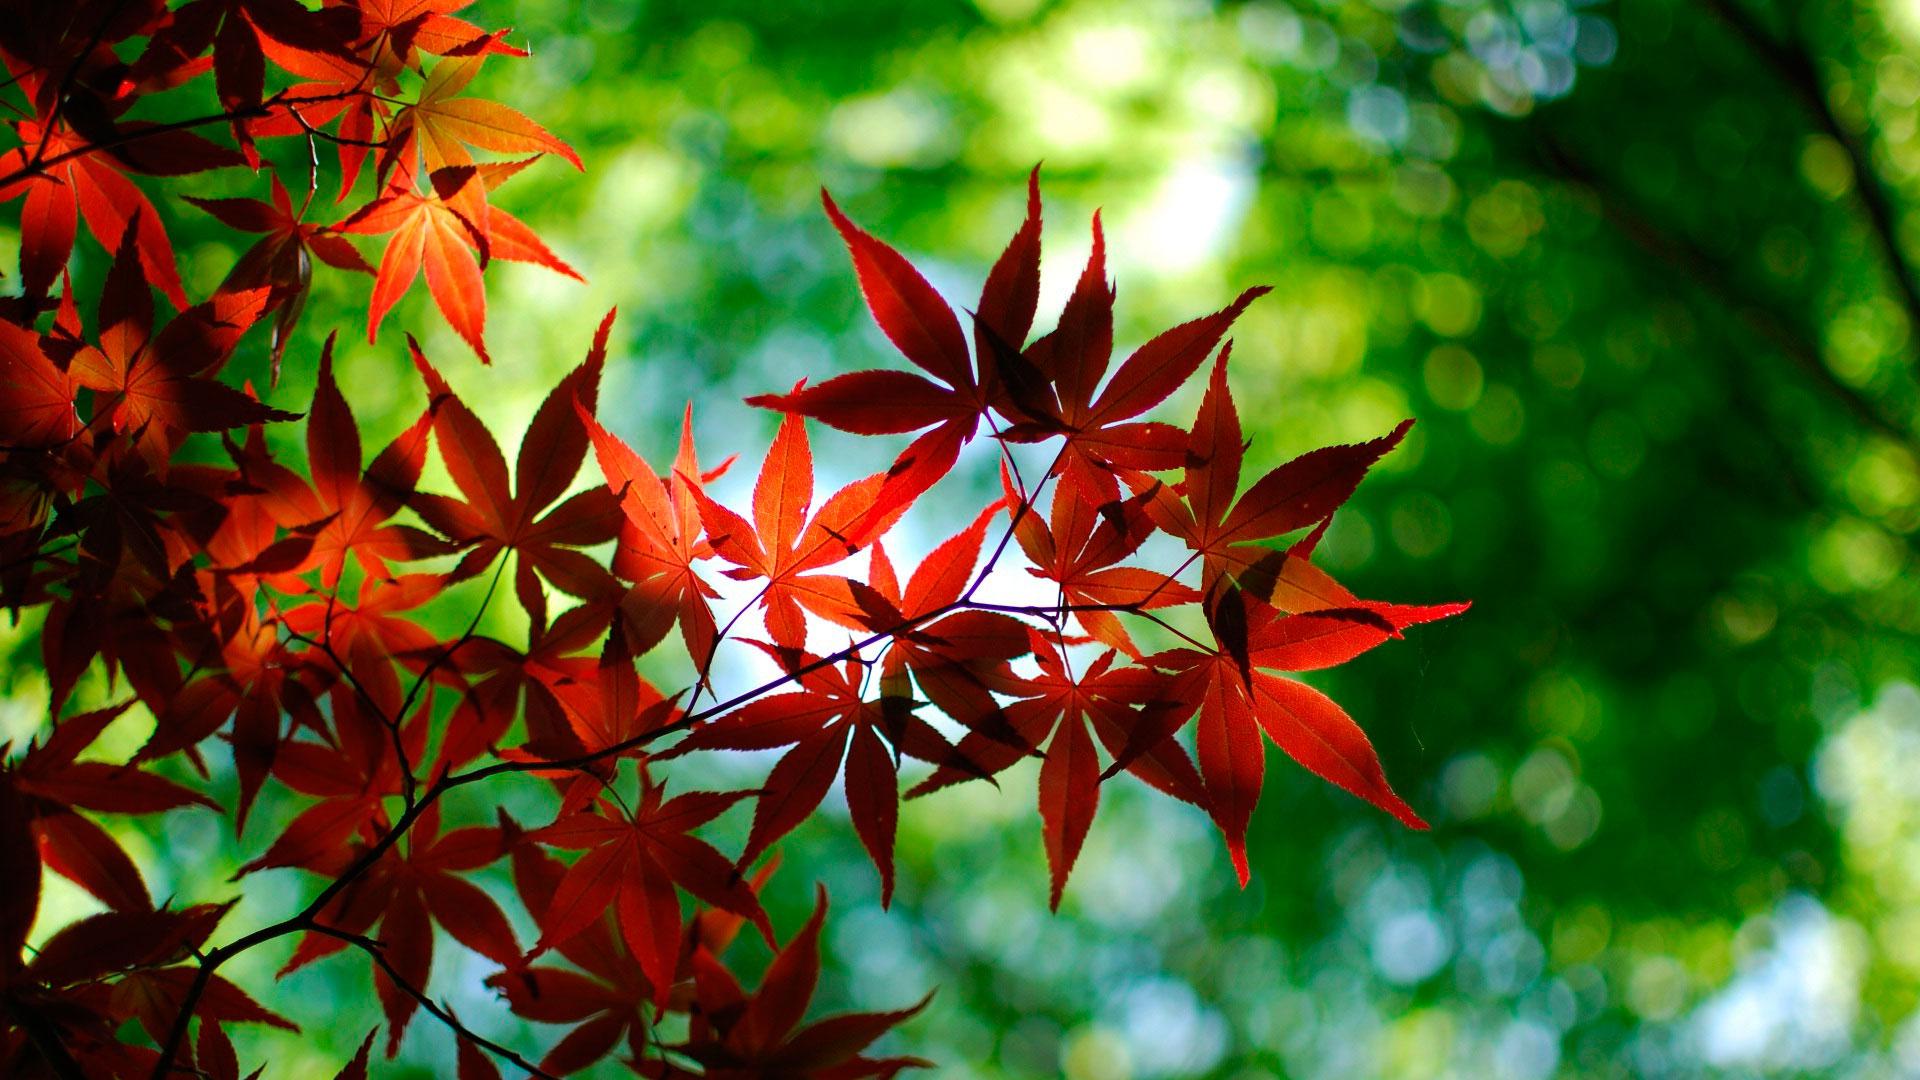 Клён — выращивание, размножение, посадка и уход